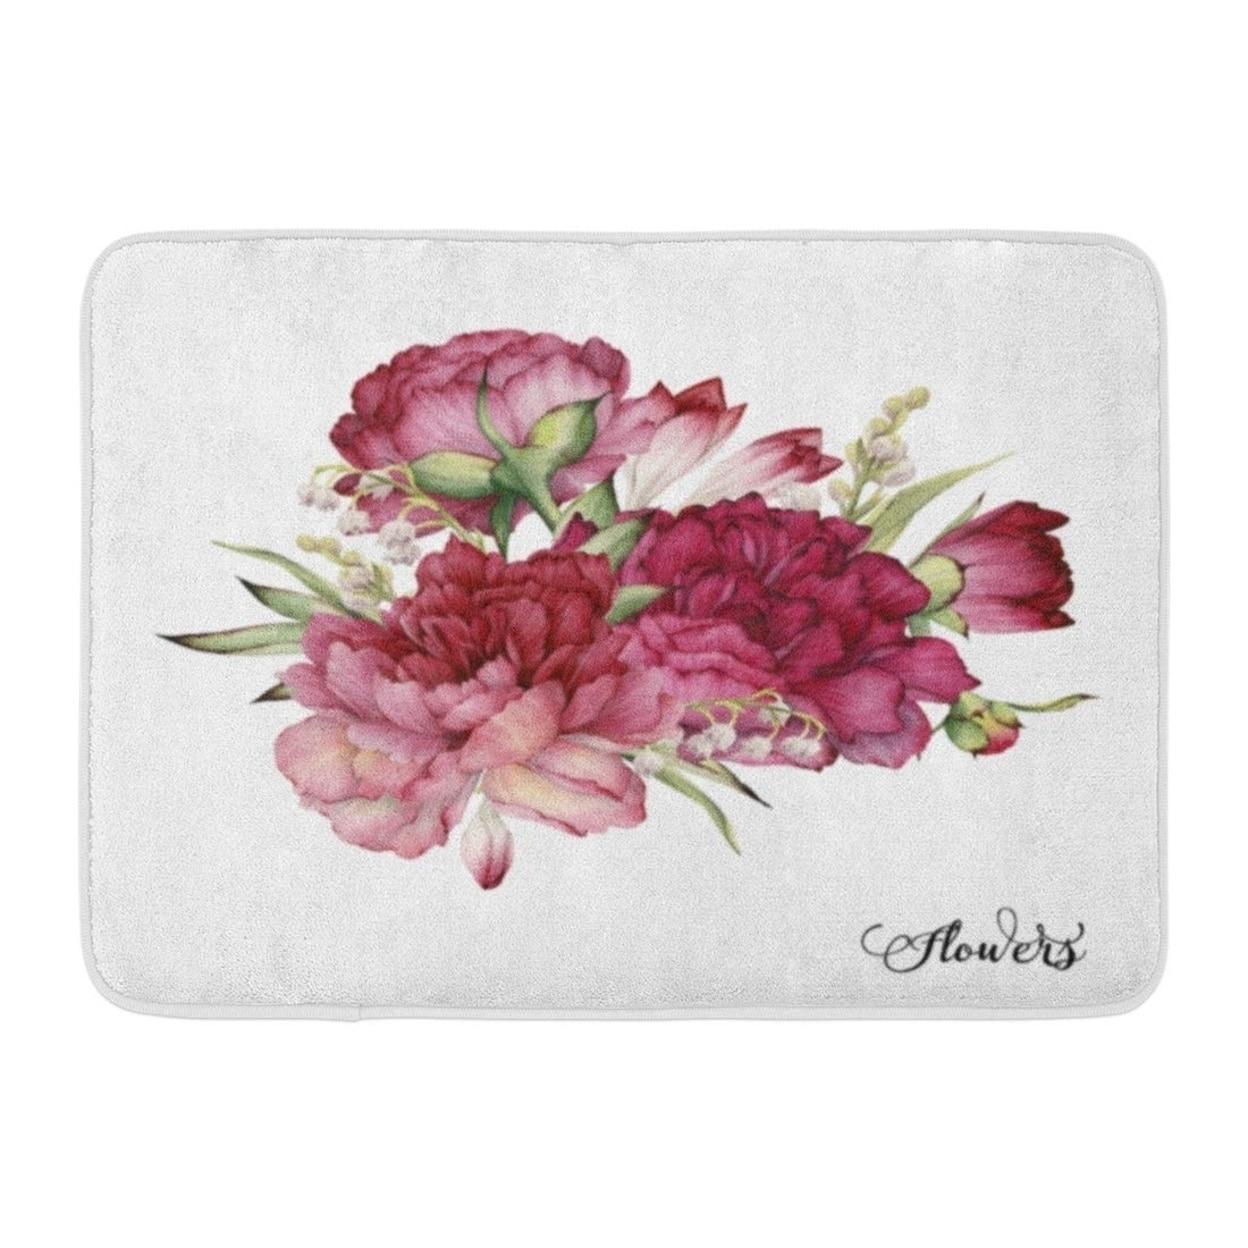 Flower Bouquet Of Peonies Watercolor For Wedding Birthday Holiday And Summer Vintage Doormat Floor Rug Bath Mat Multi Overstock 31776424